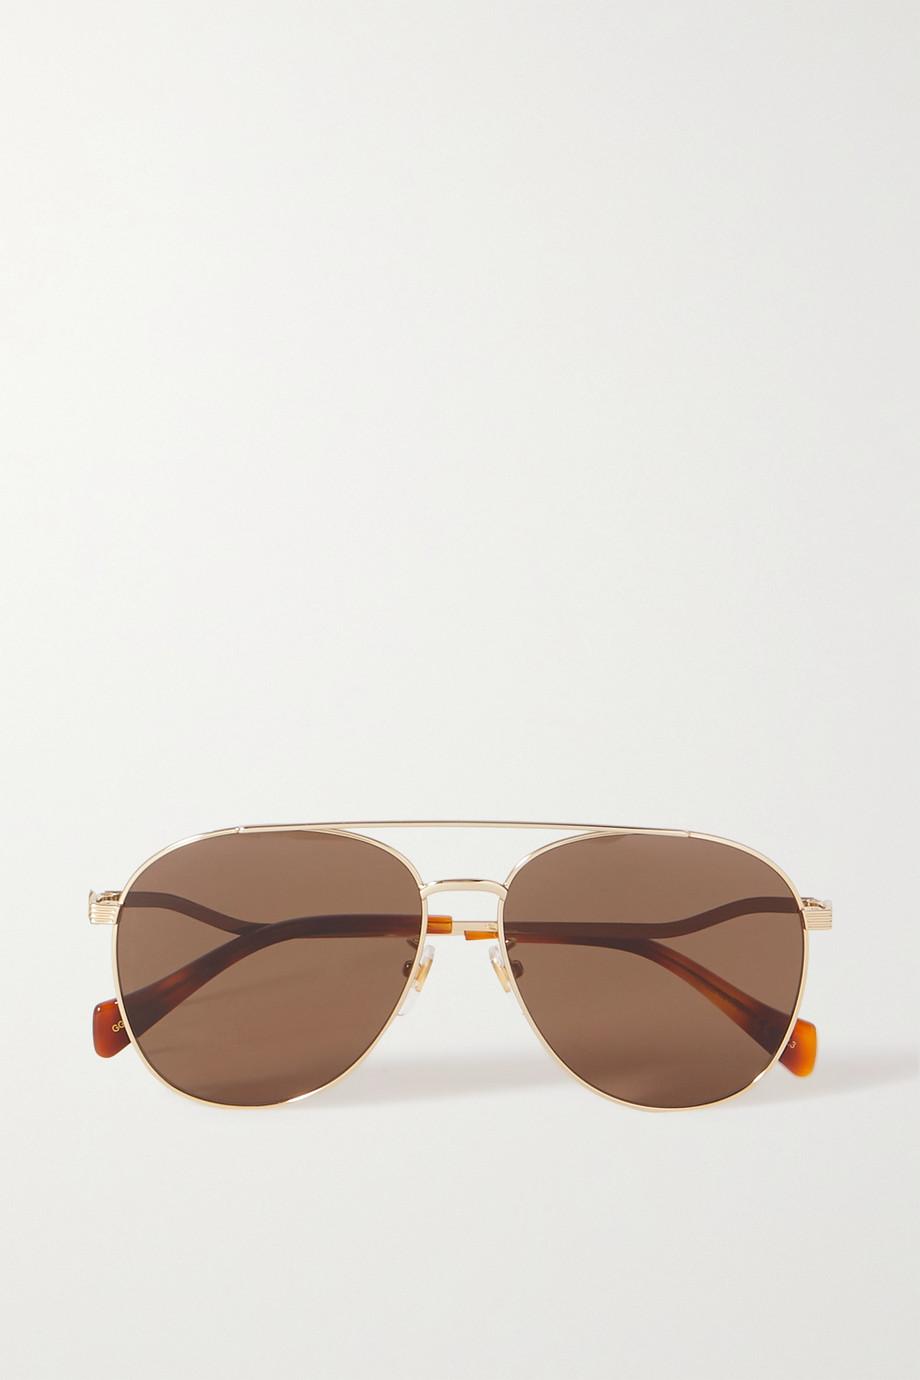 Gucci Eave goldfarbene Pilotensonnenbrille